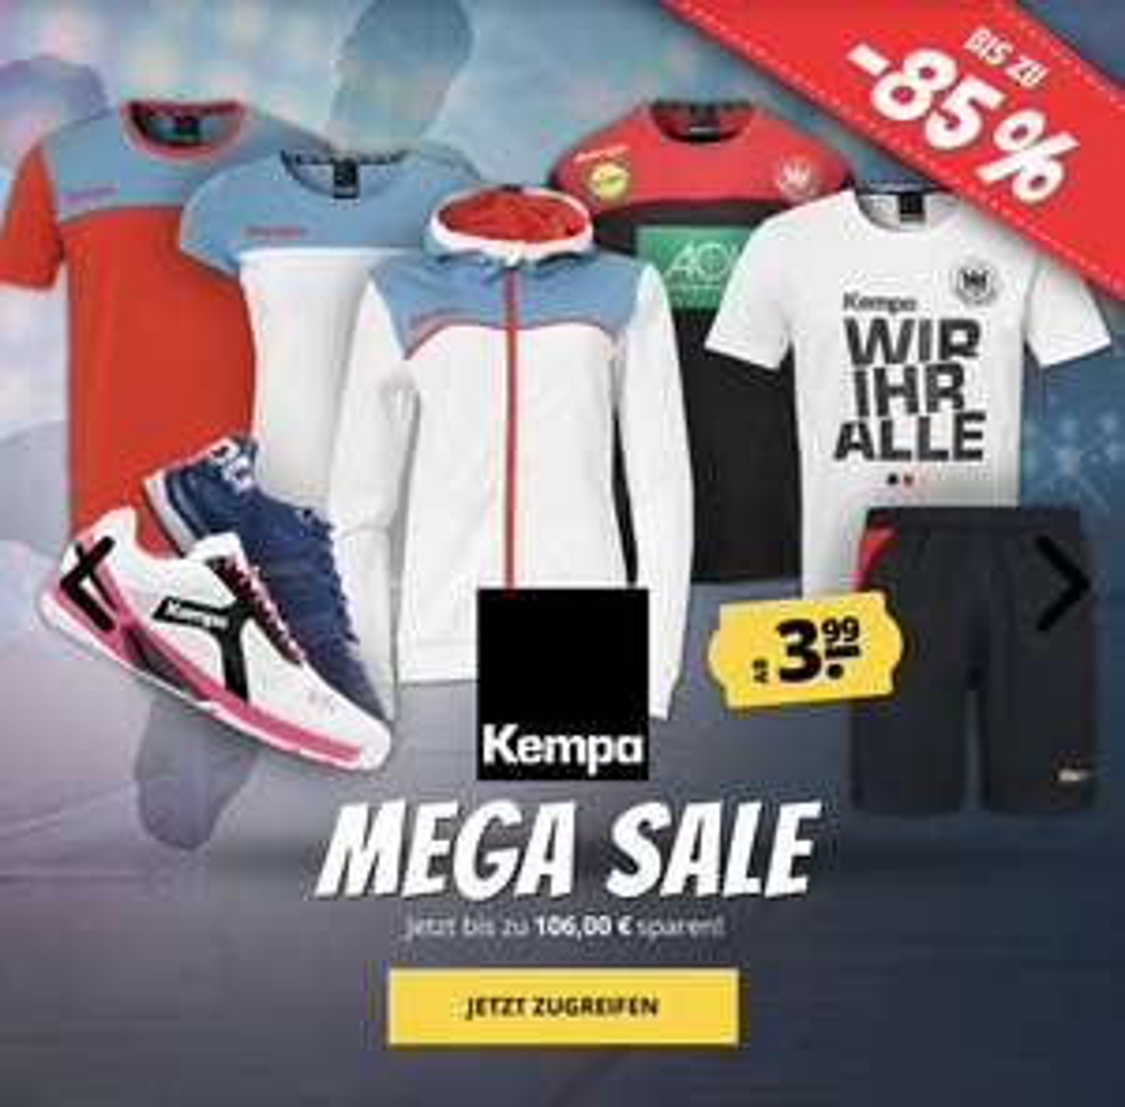 [SportSpar] Kempa Mega Sale bis zu -85% sparen!!